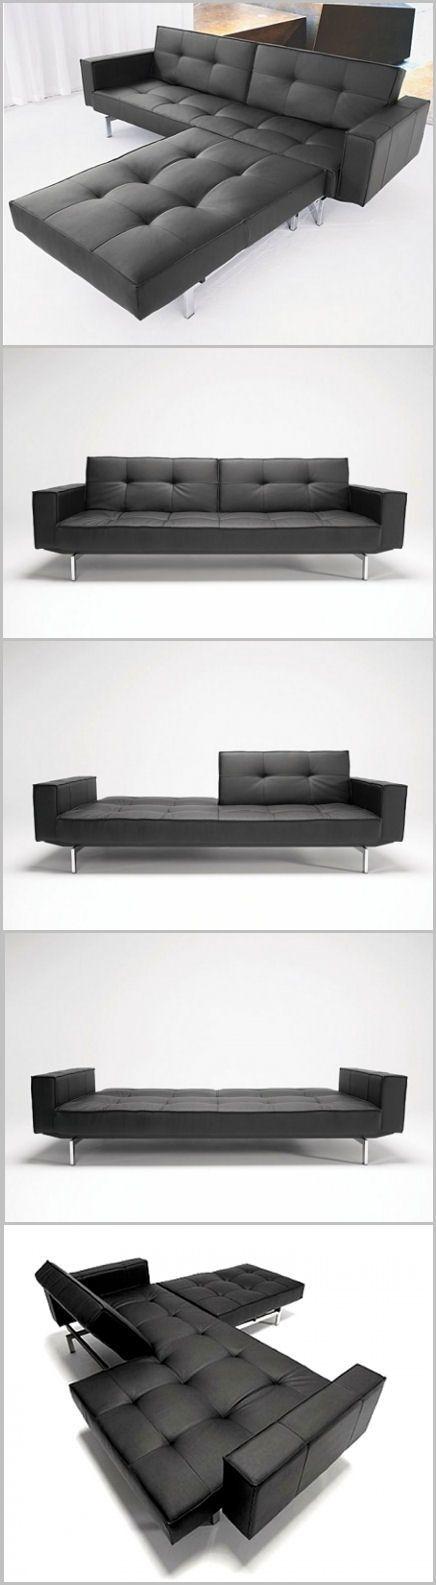 Modern Modular Convertible Sofa ♥